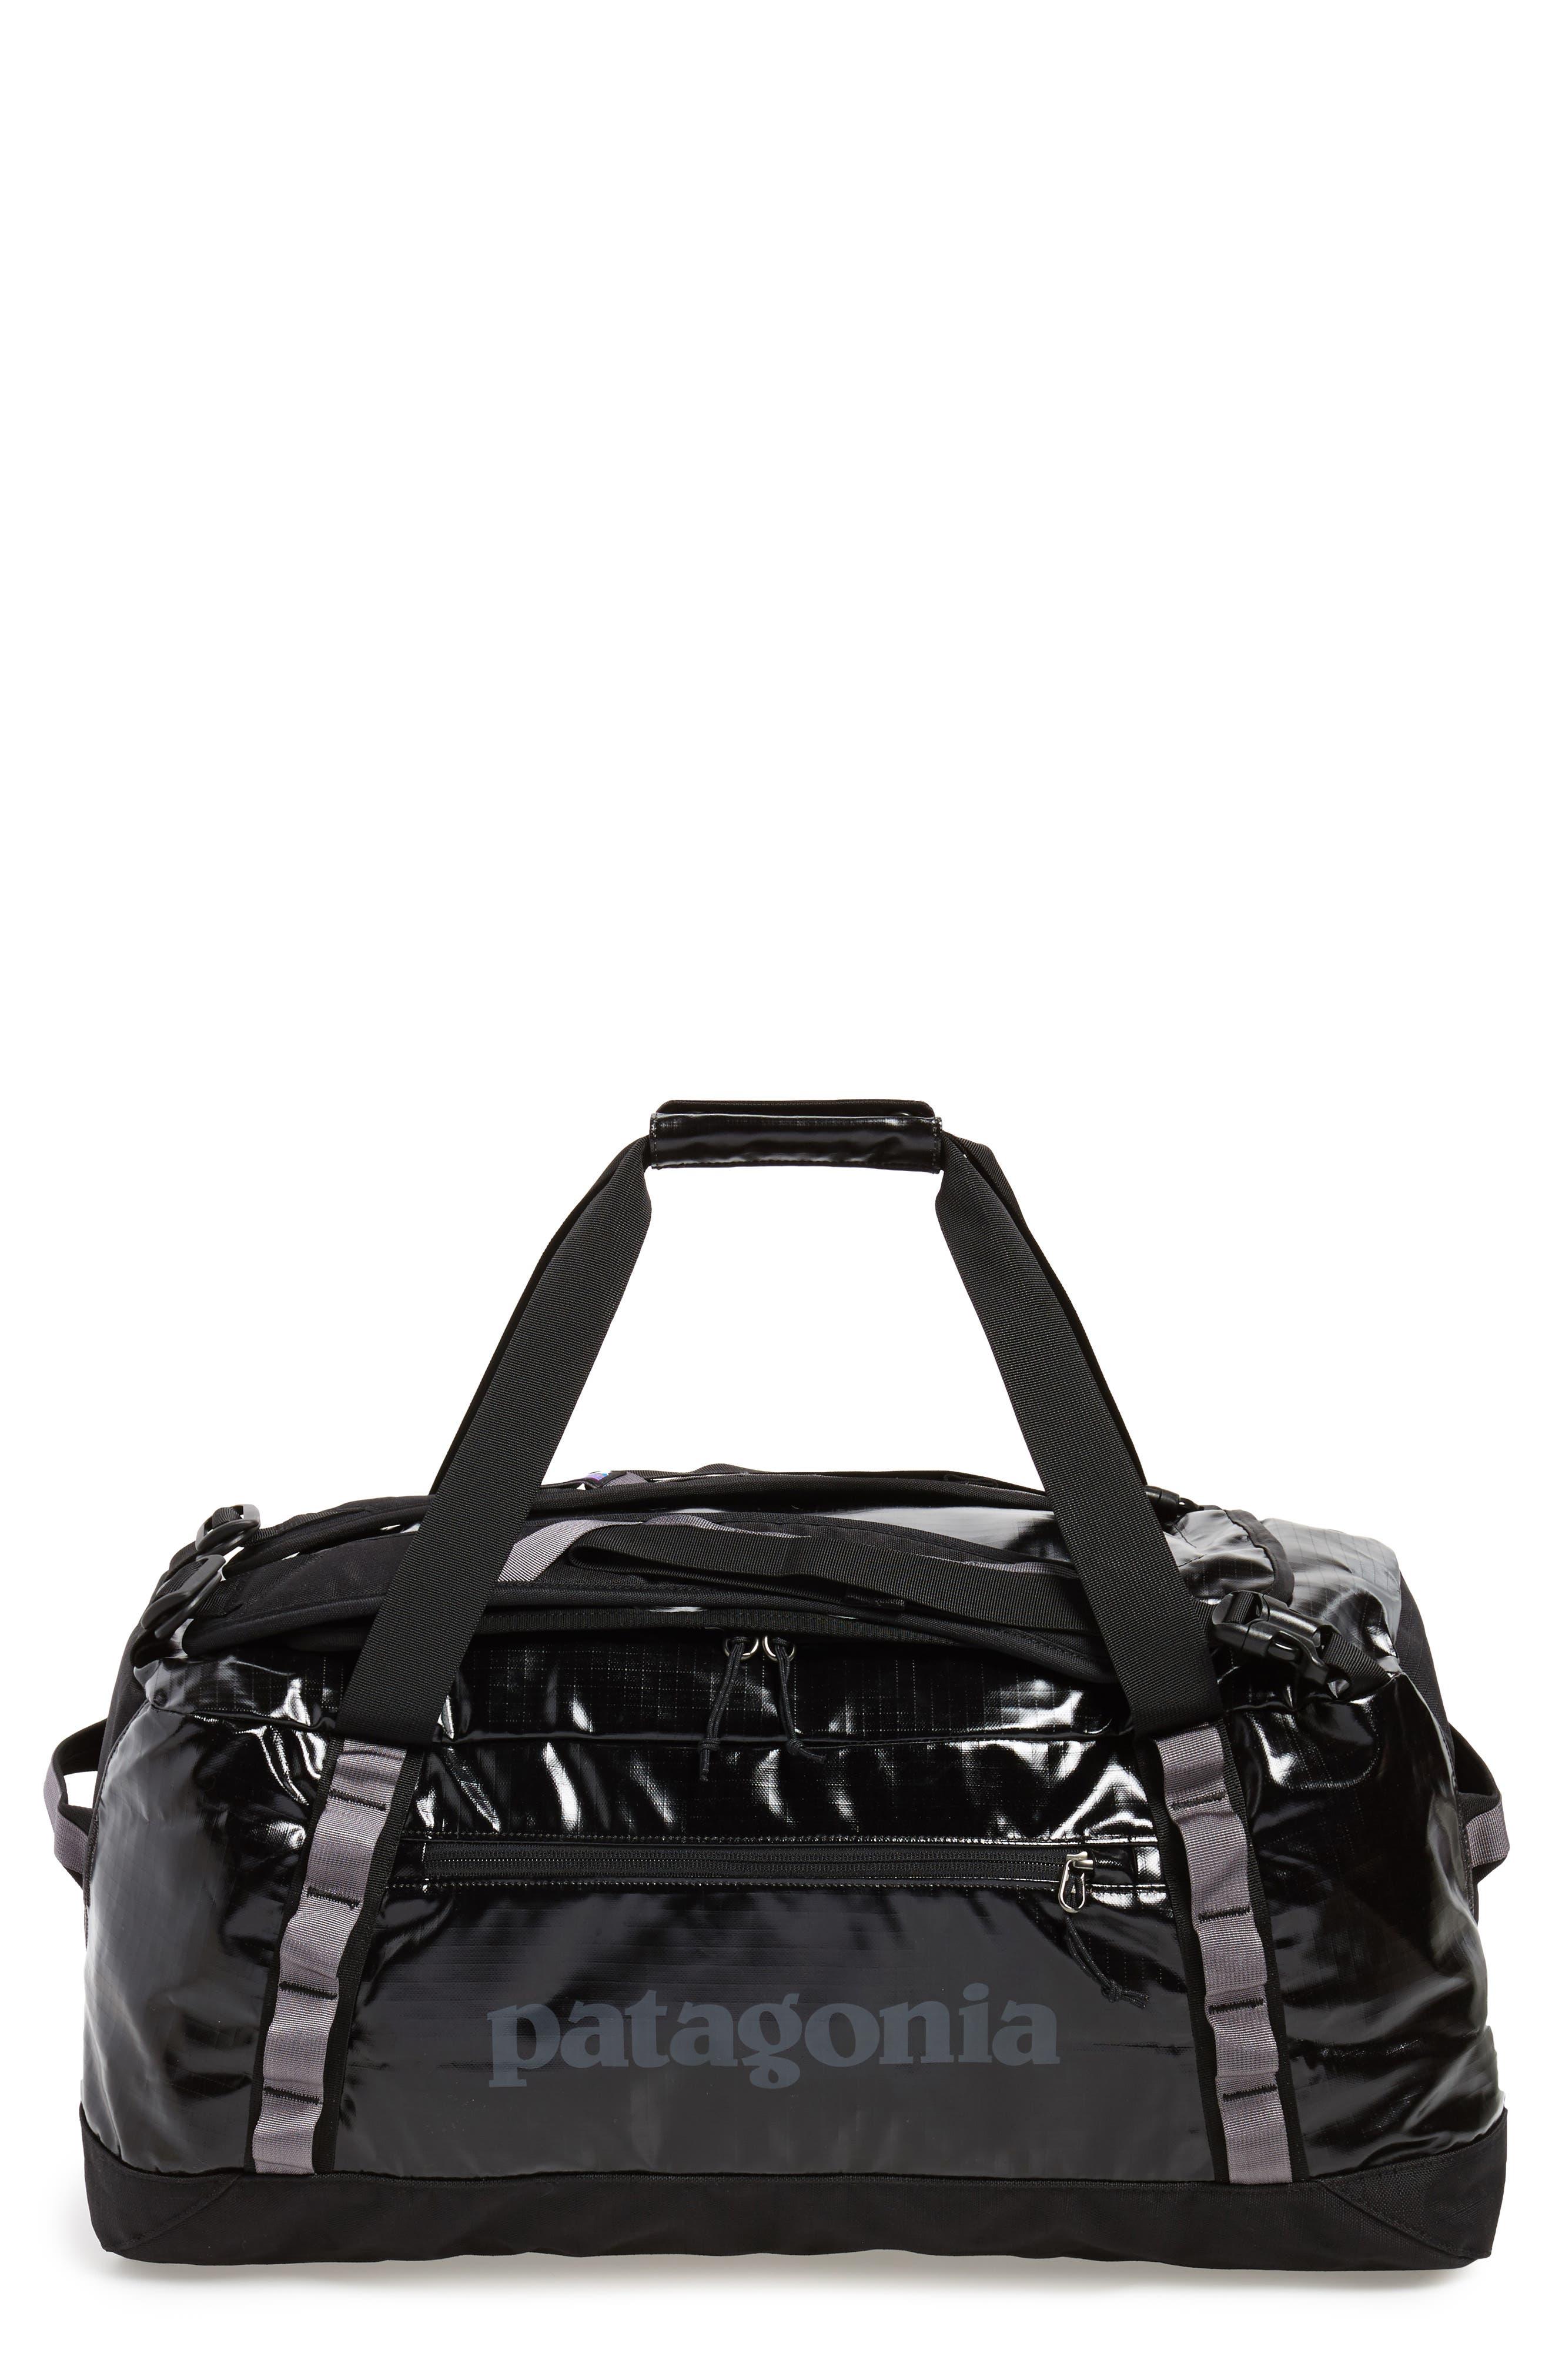 Black Hole Water Repellent Duffel Bag,                         Main,                         color, Black